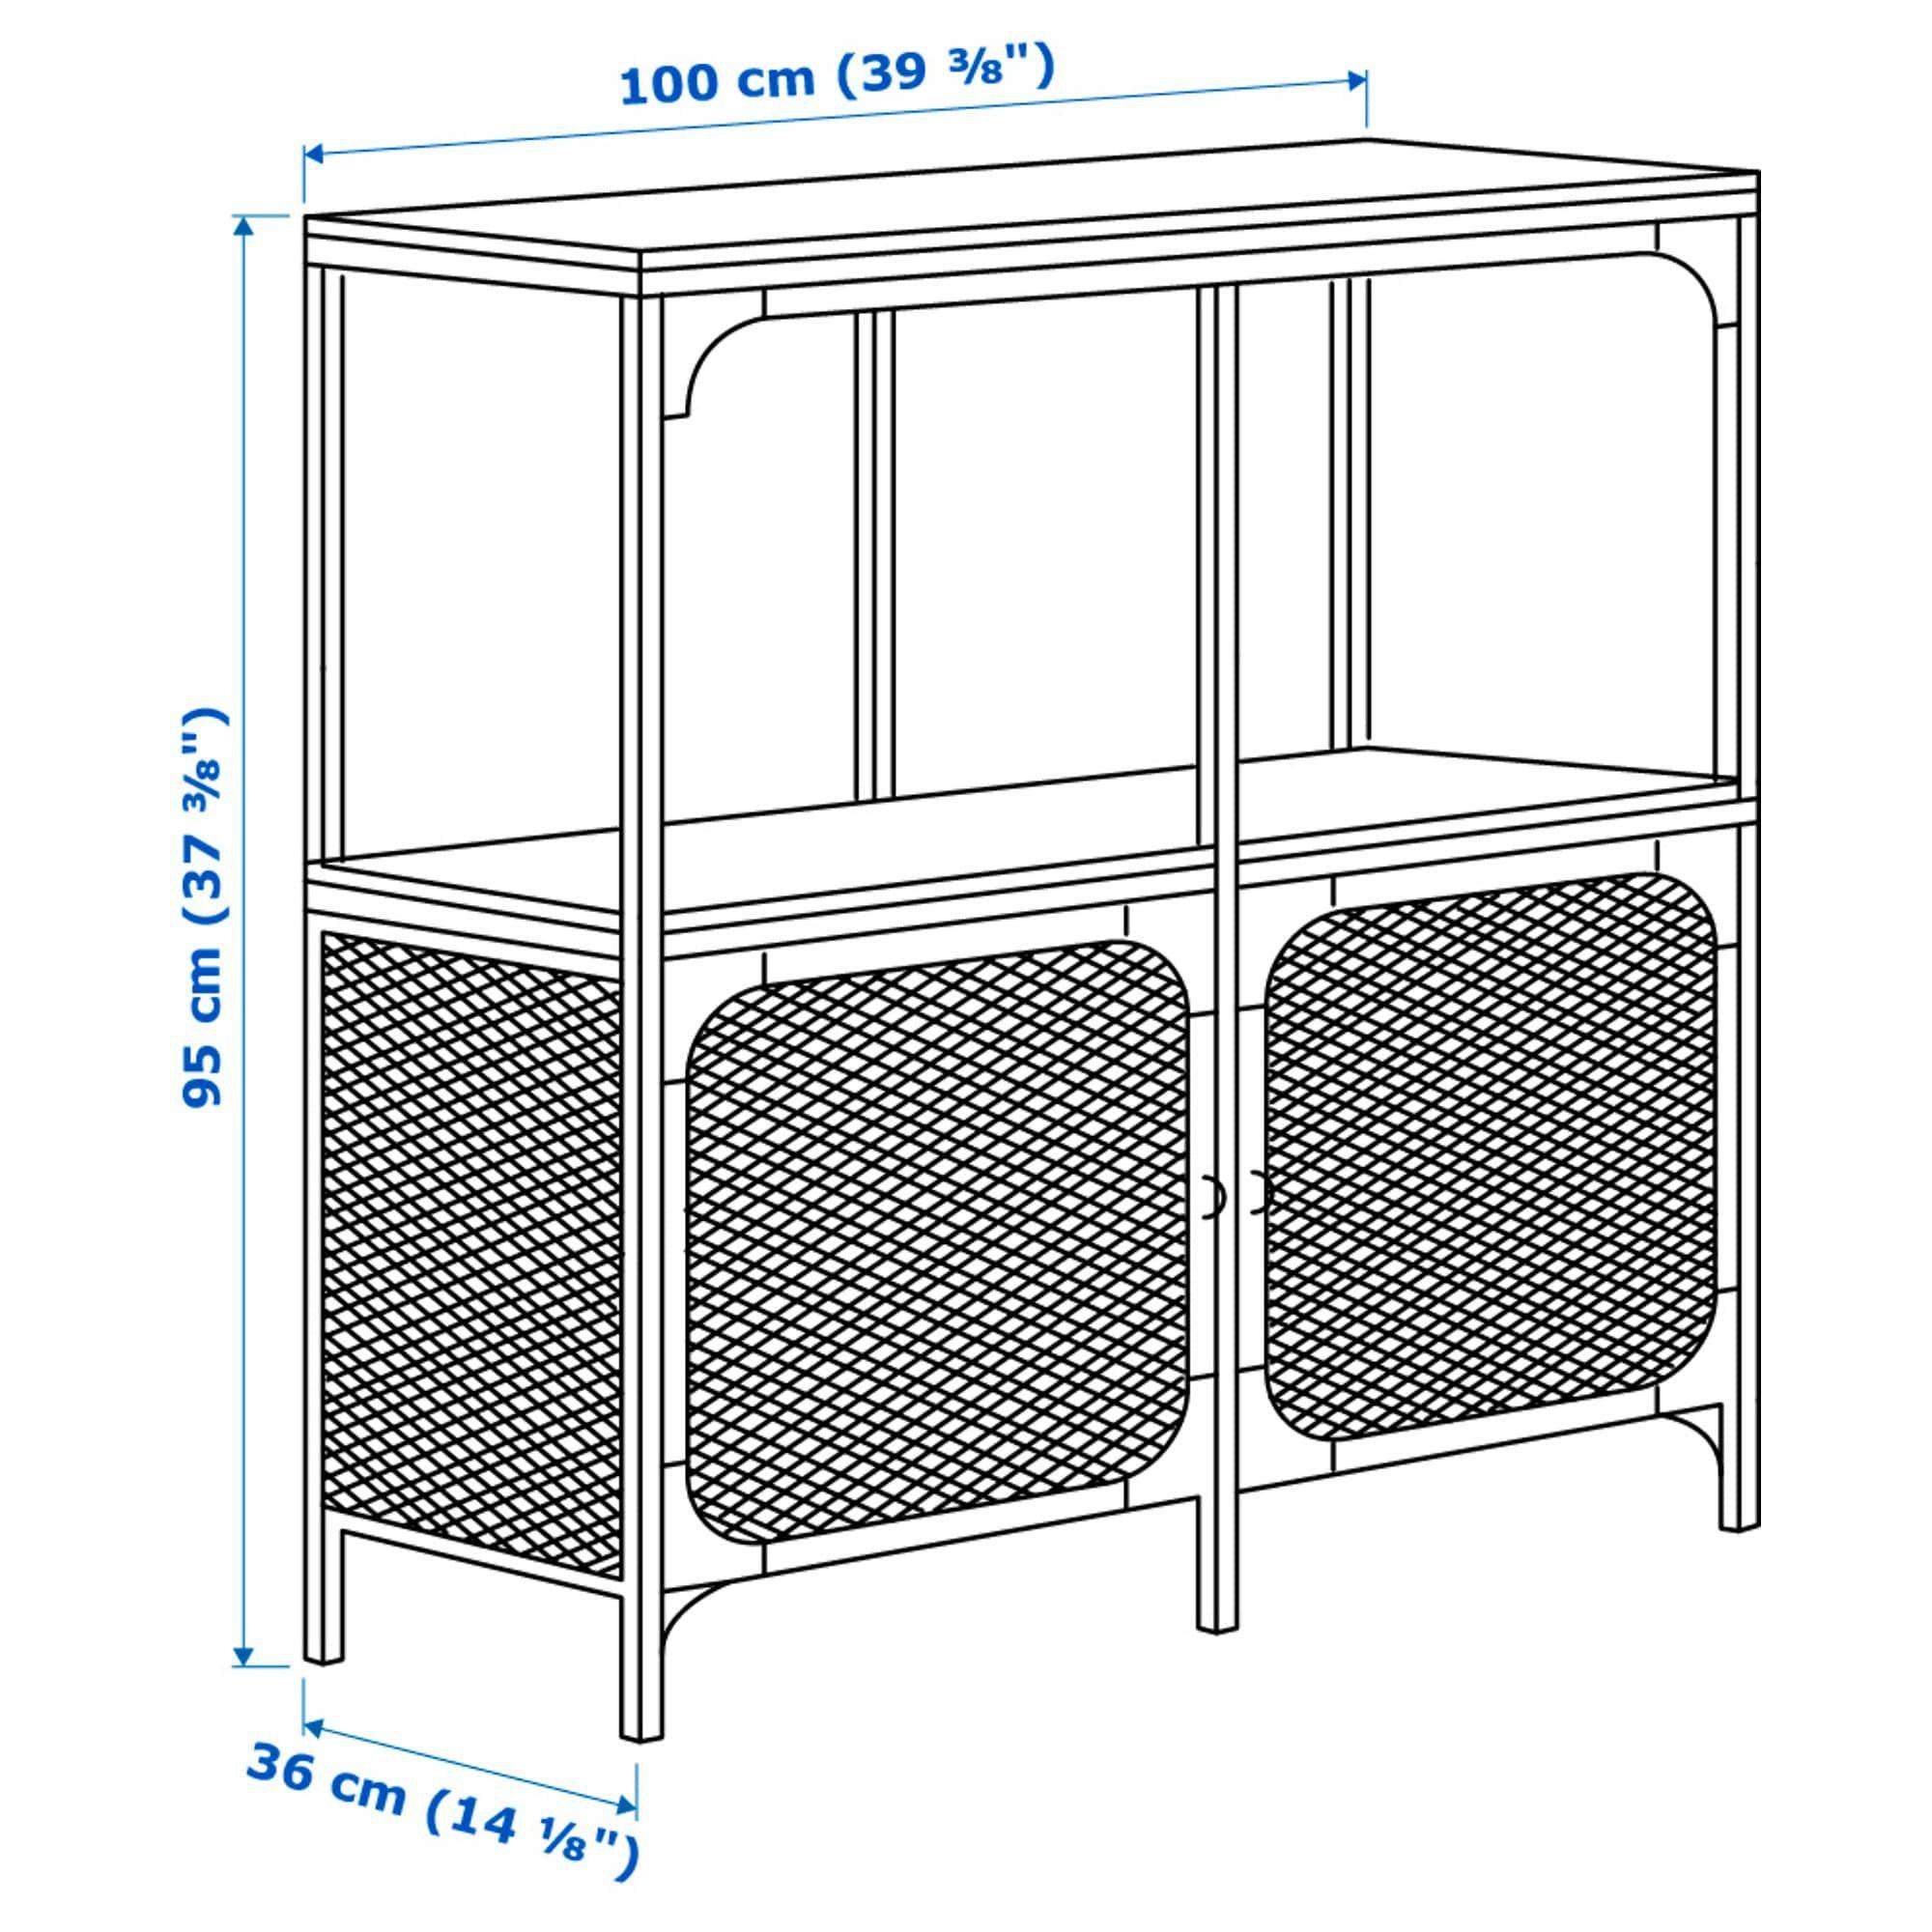 Fjallbo Black Shelving Unit 100x95 Cm Ikea Shelf Unit Solid Wood Shelves Kitchen Storage Units